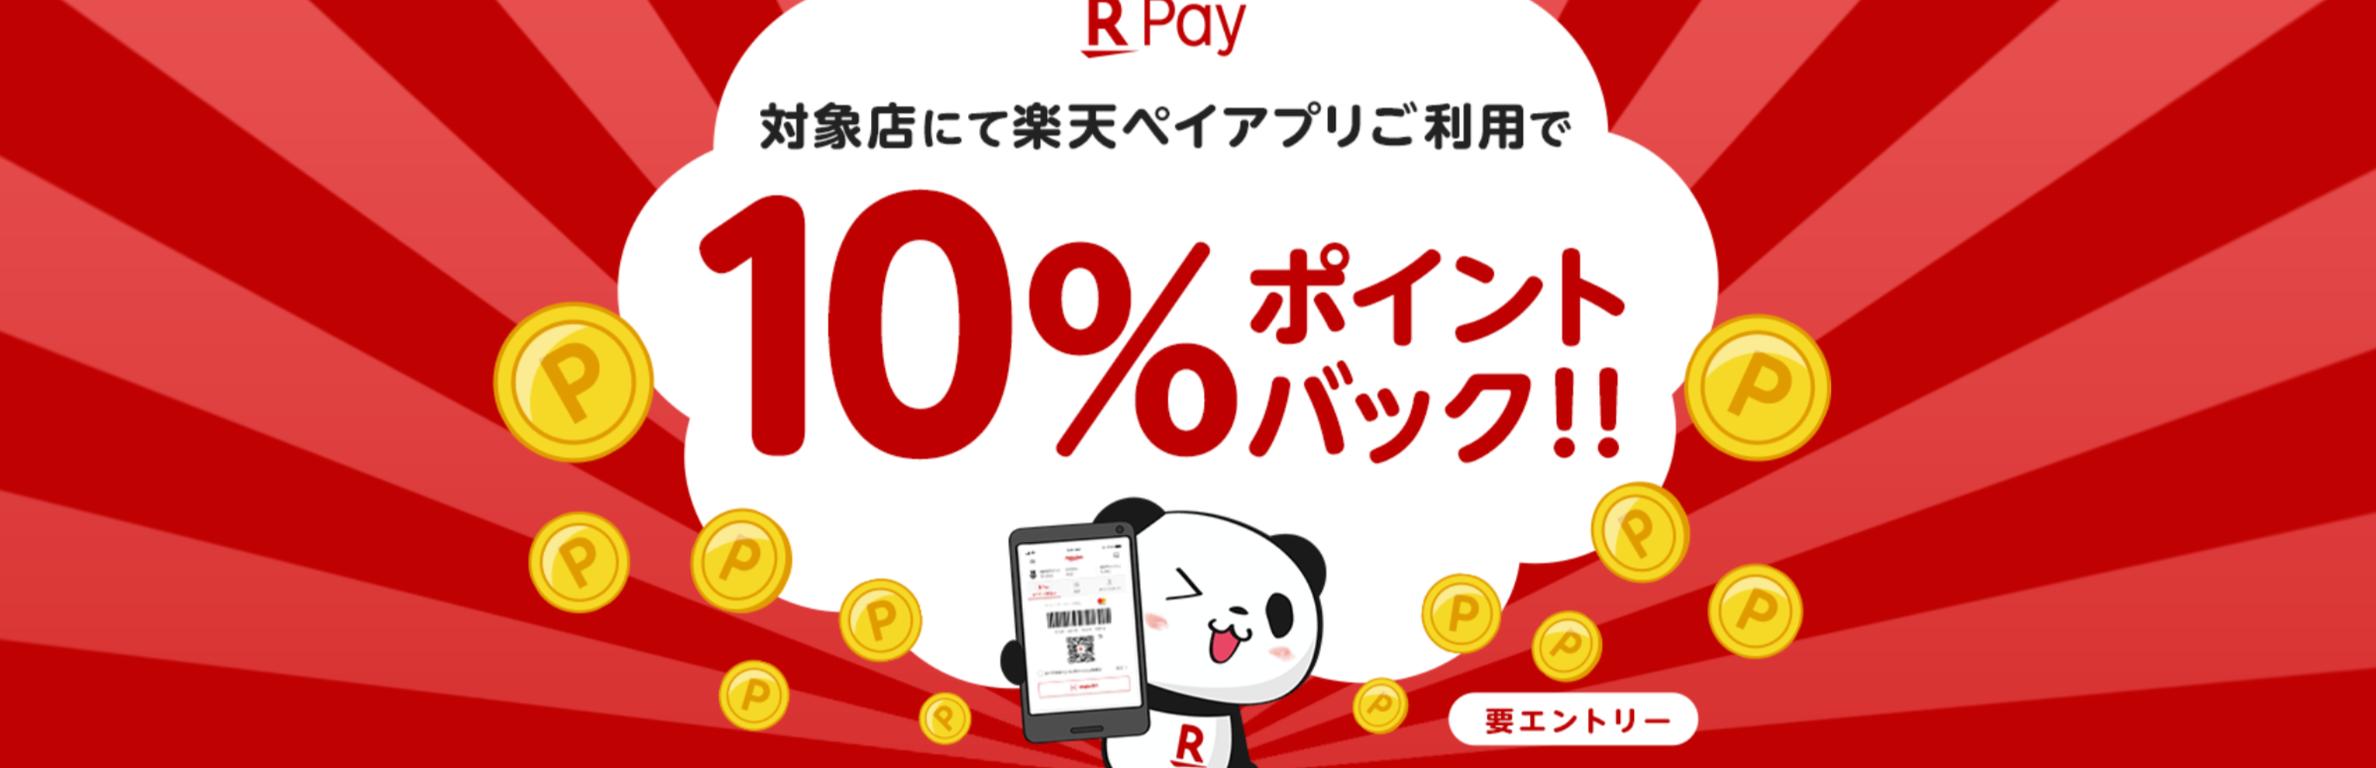 rakuten-pay